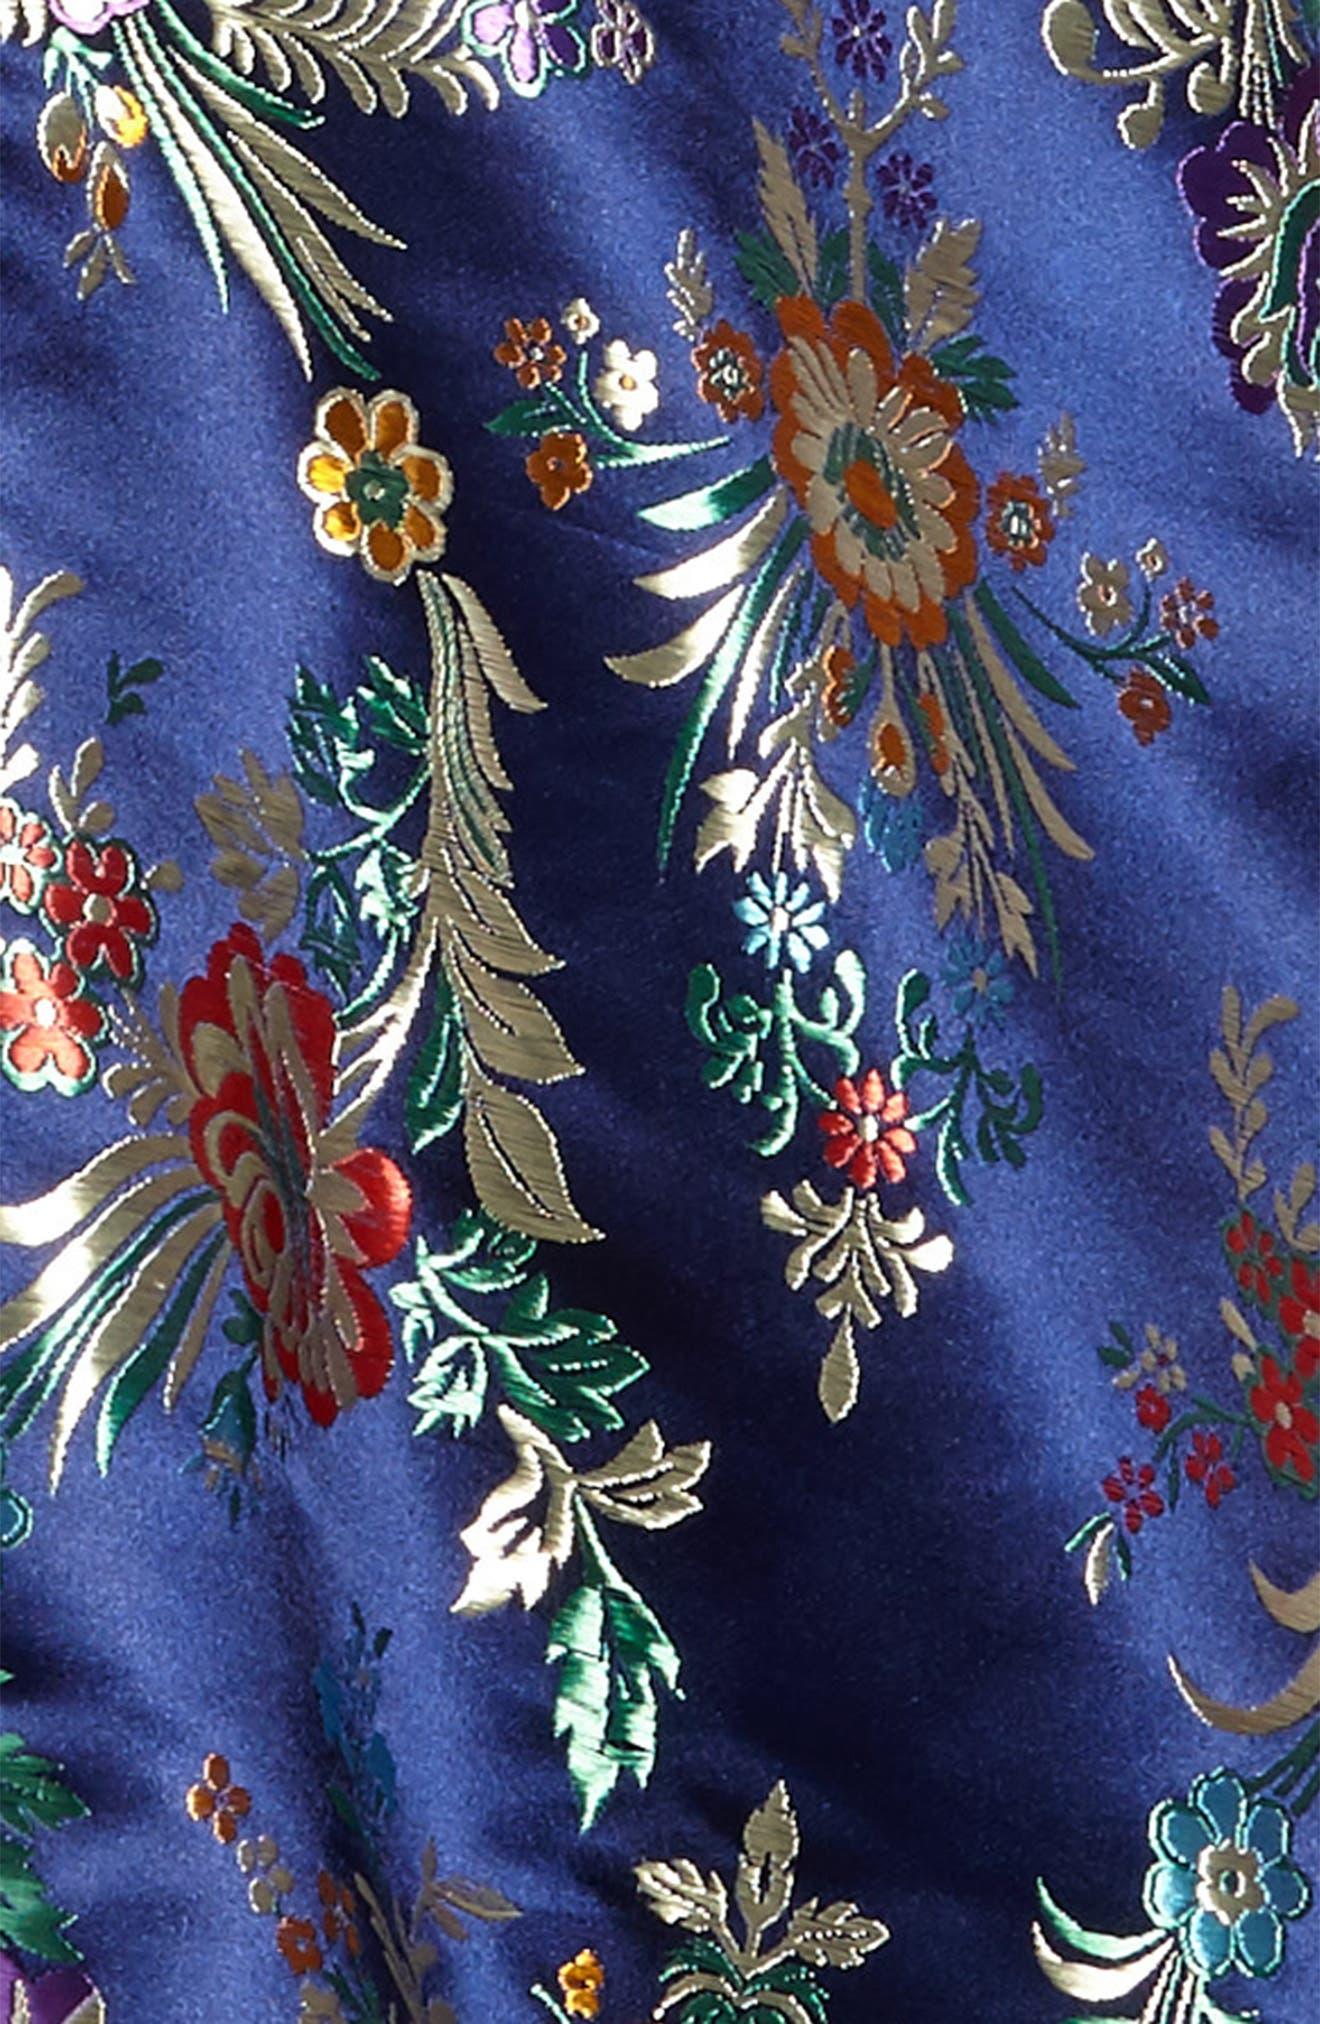 Metallic Floral Jacquard Dress,                             Alternate thumbnail 3, color,                             436